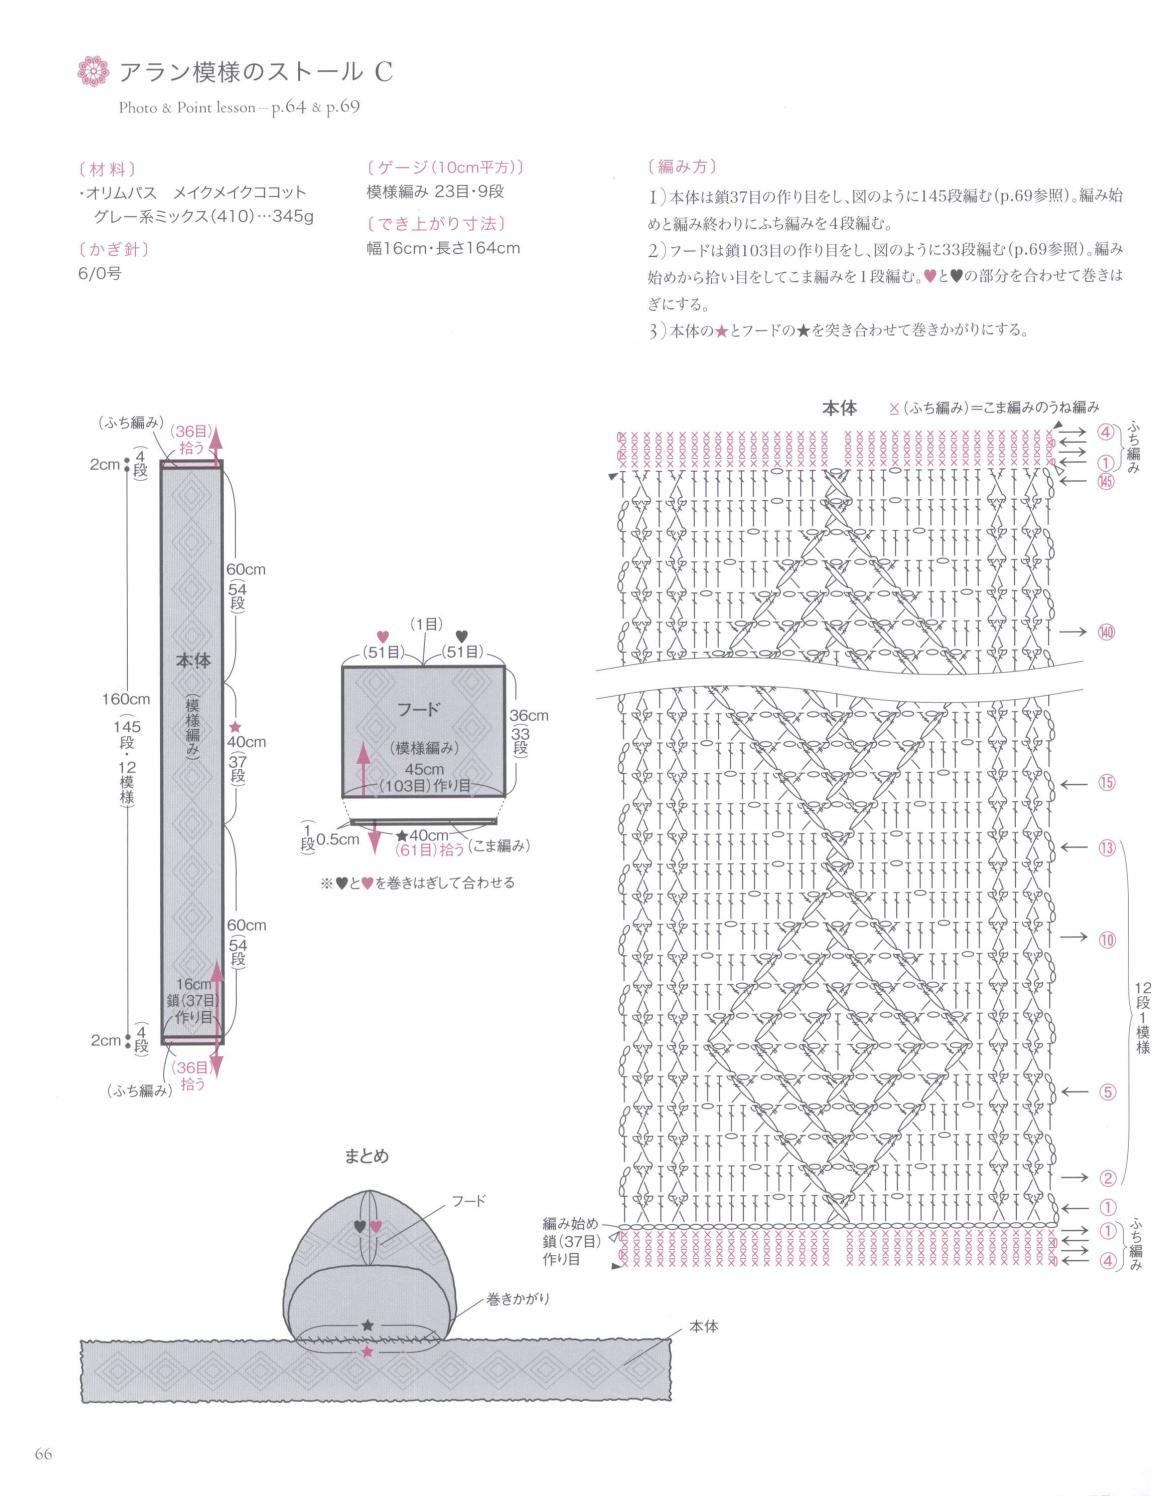 Asahi original crochet best selection 2012 page 66